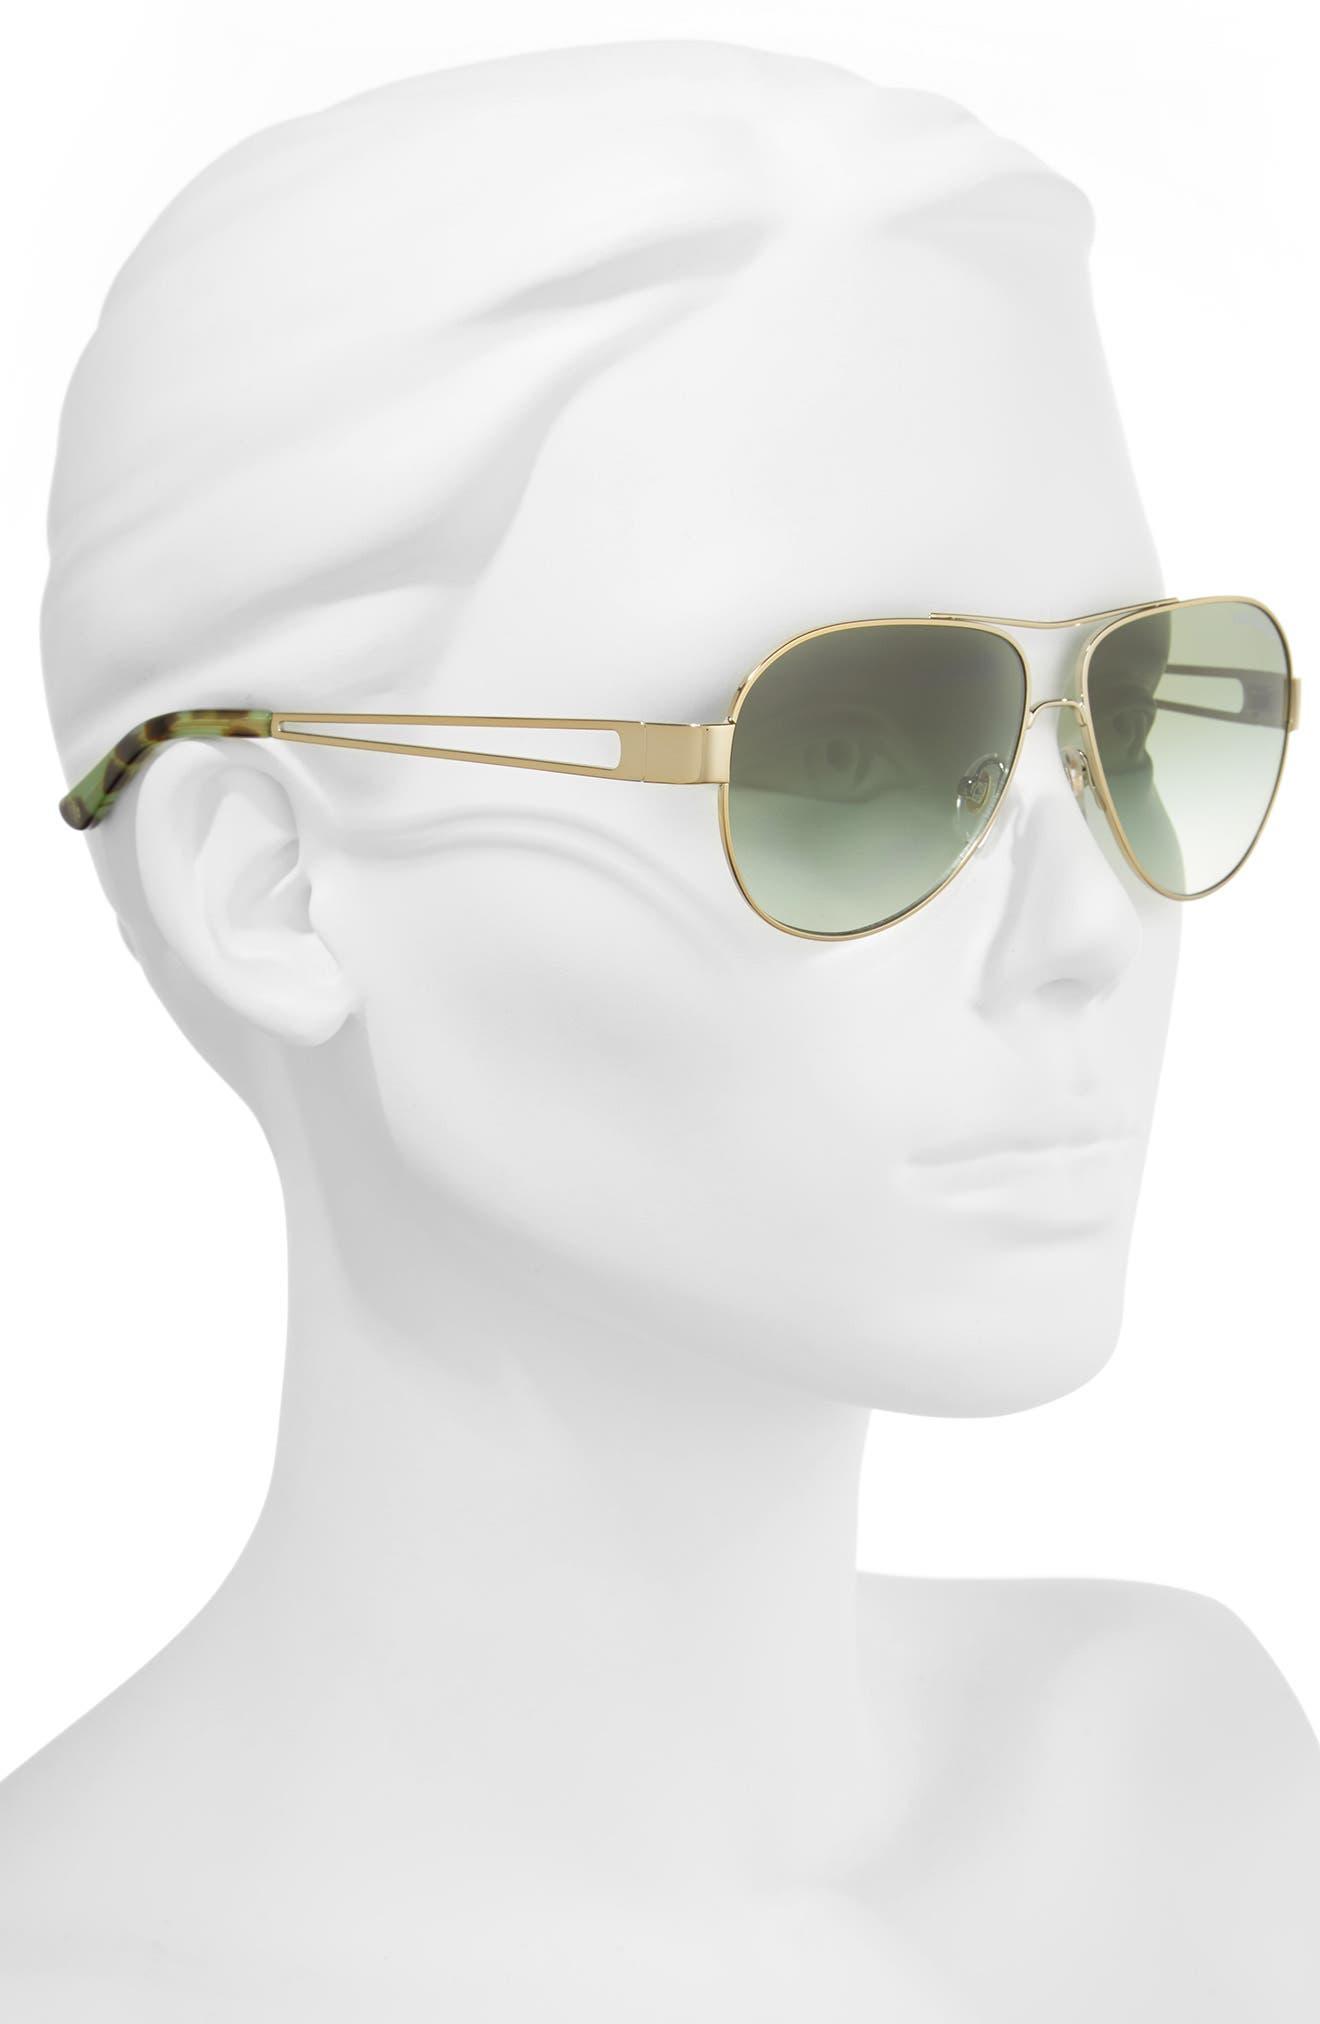 55mm Polarized Aviator Sunglasses,                             Alternate thumbnail 7, color,